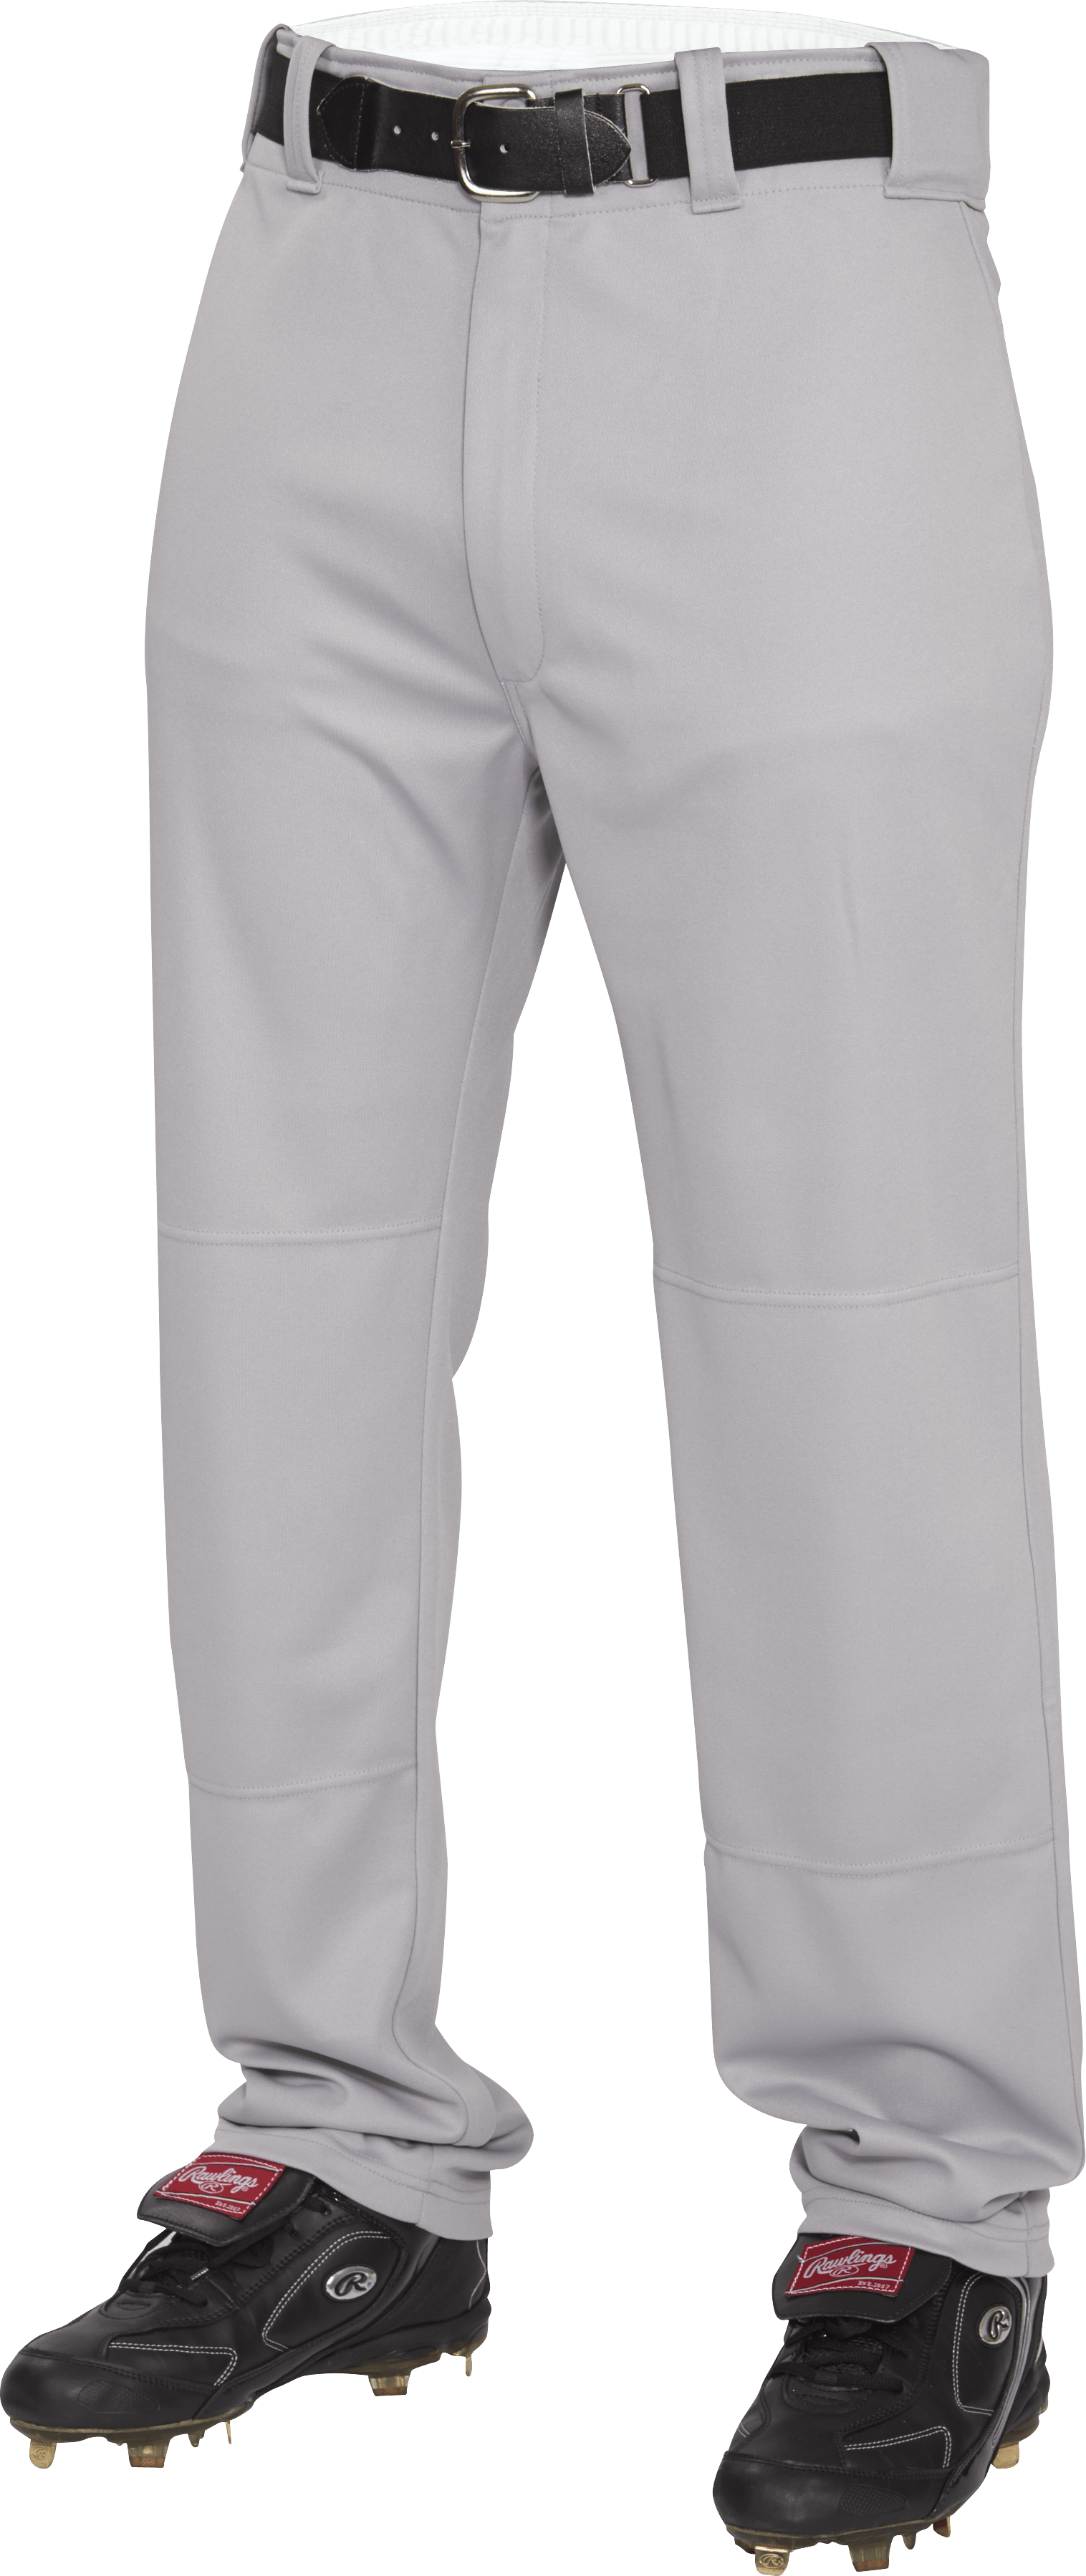 Rawlings RBBP95 Grey//Royal Pinstripe Baseball Pant Adult